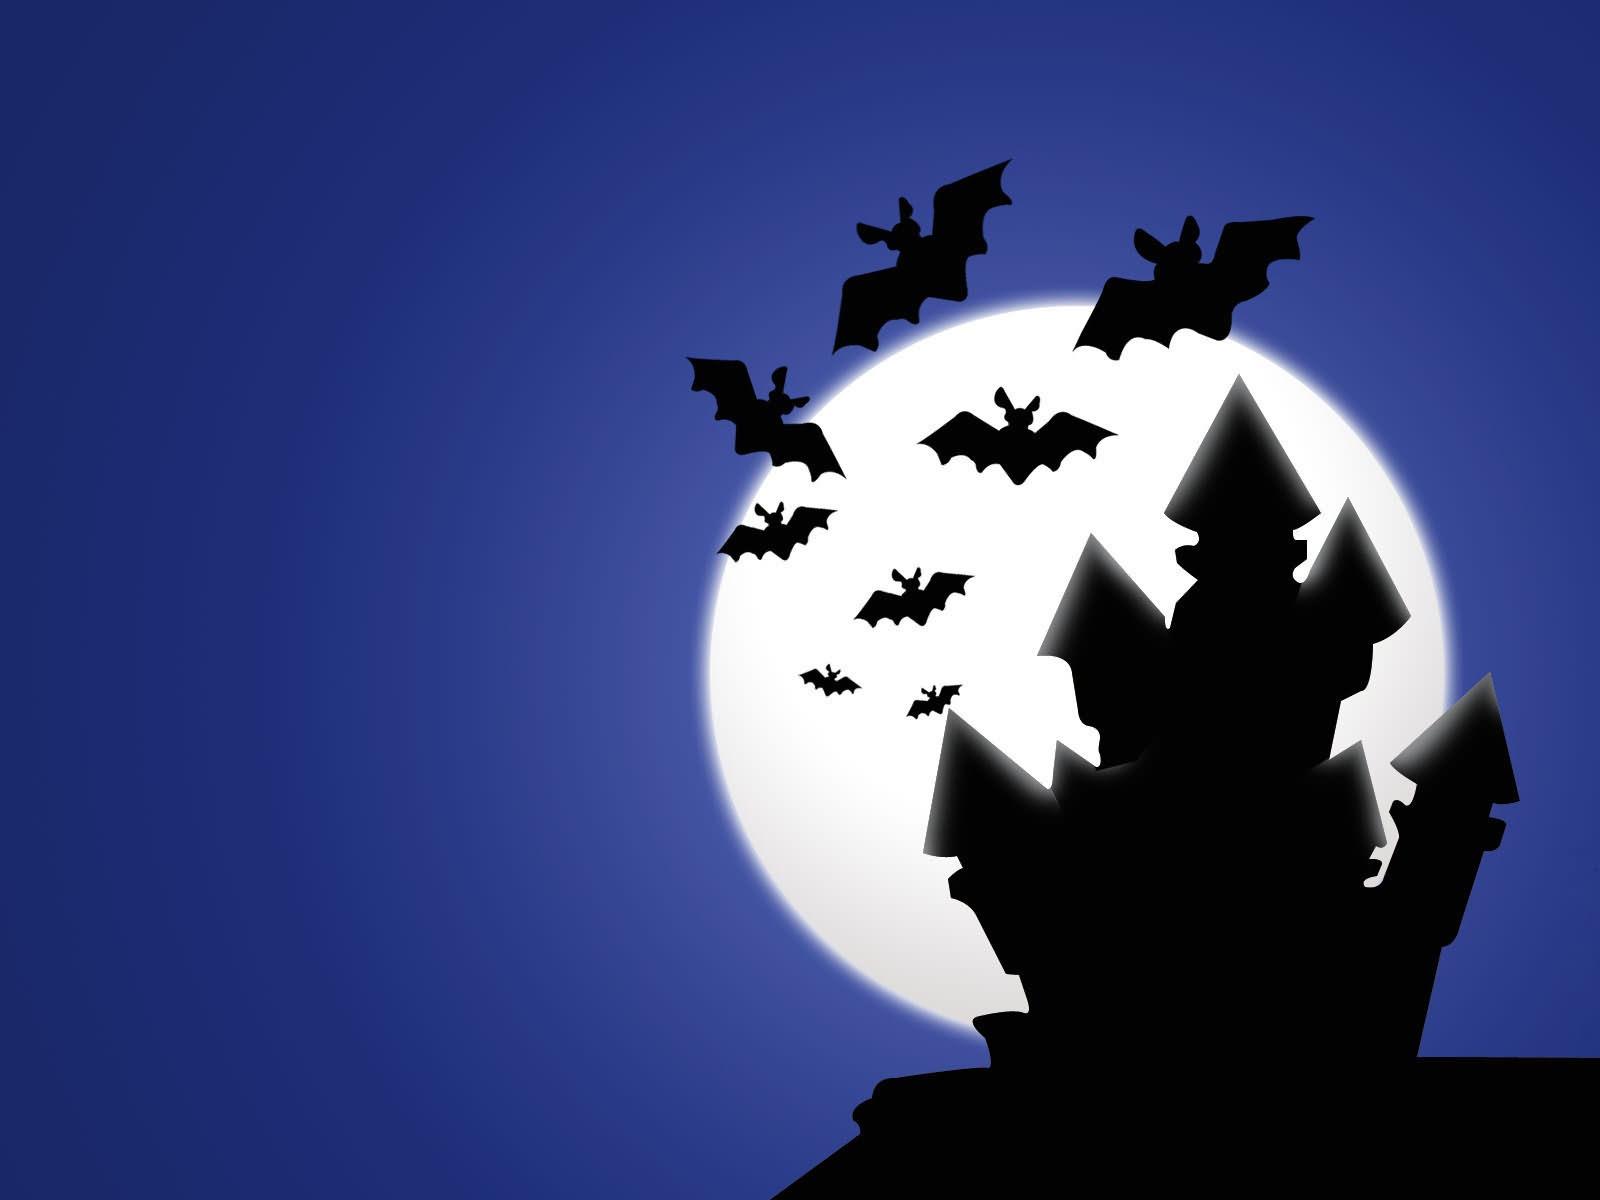 House Of Bats On Halloween